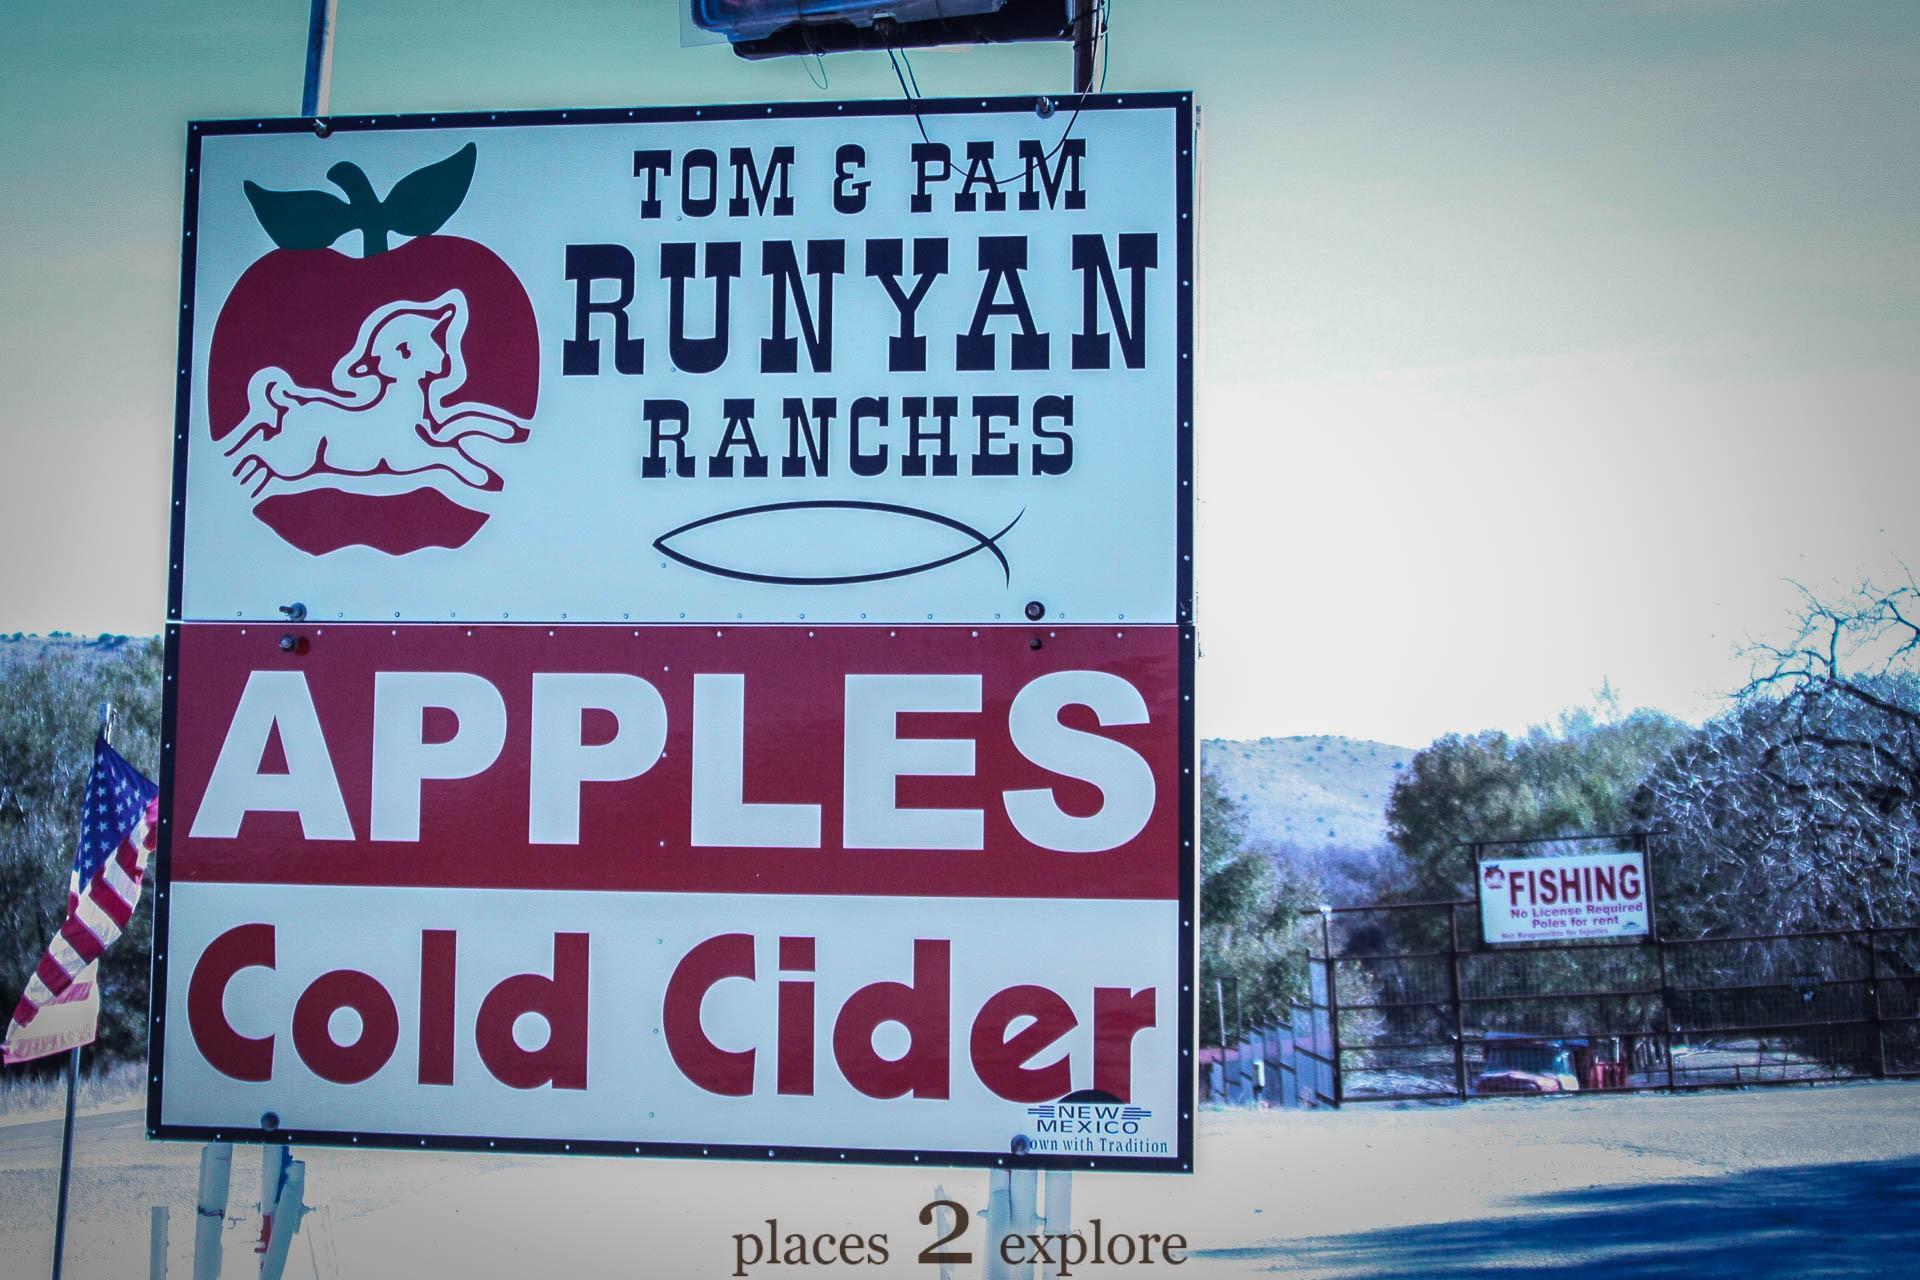 Tom & Pam Runyan Ranches